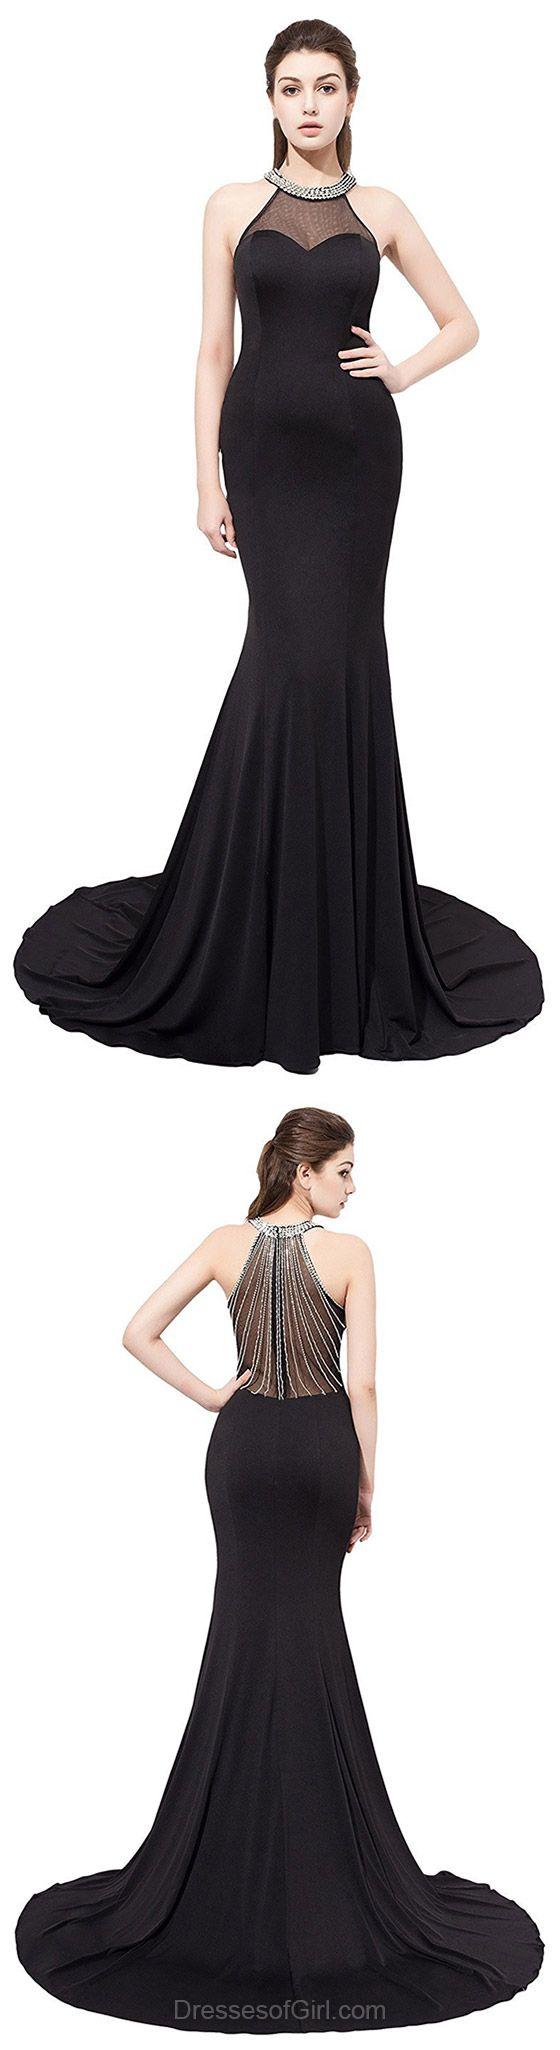 best black prom dresses images on pinterest